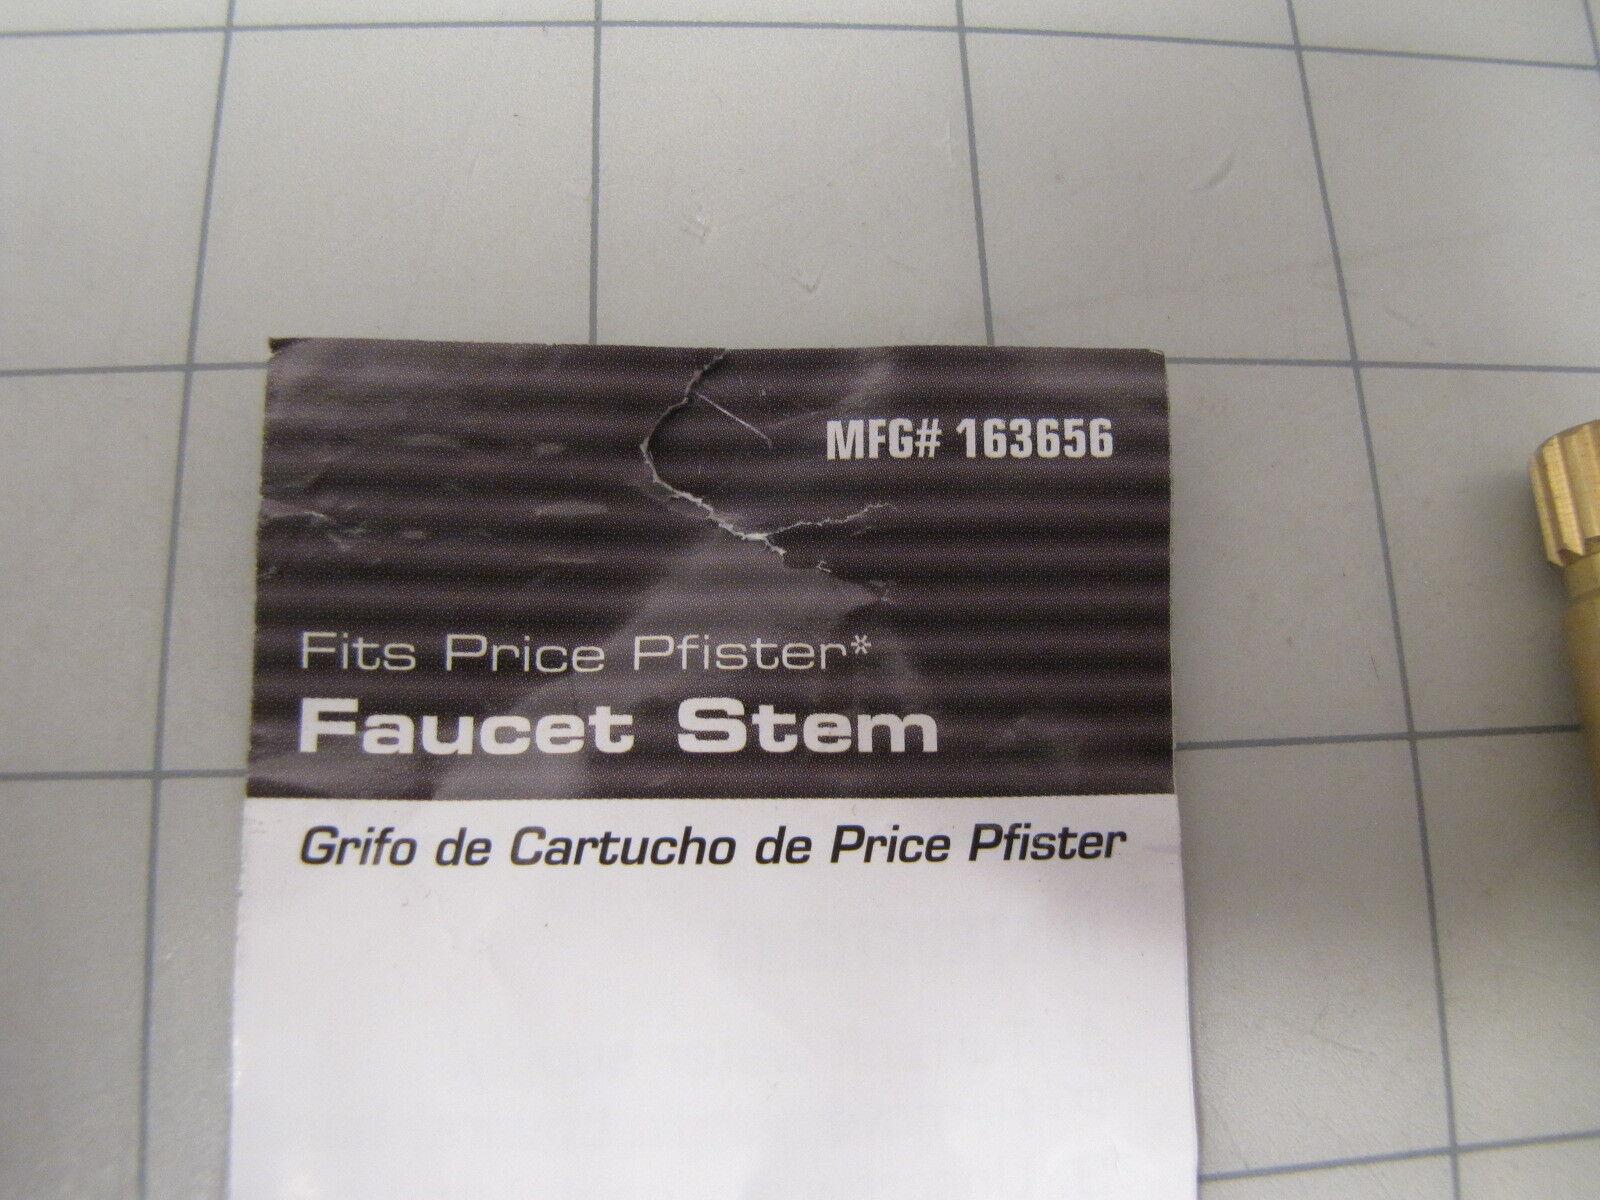 ProPlus 163656 Faucet Diverter Stem Fits Pfister | eBay